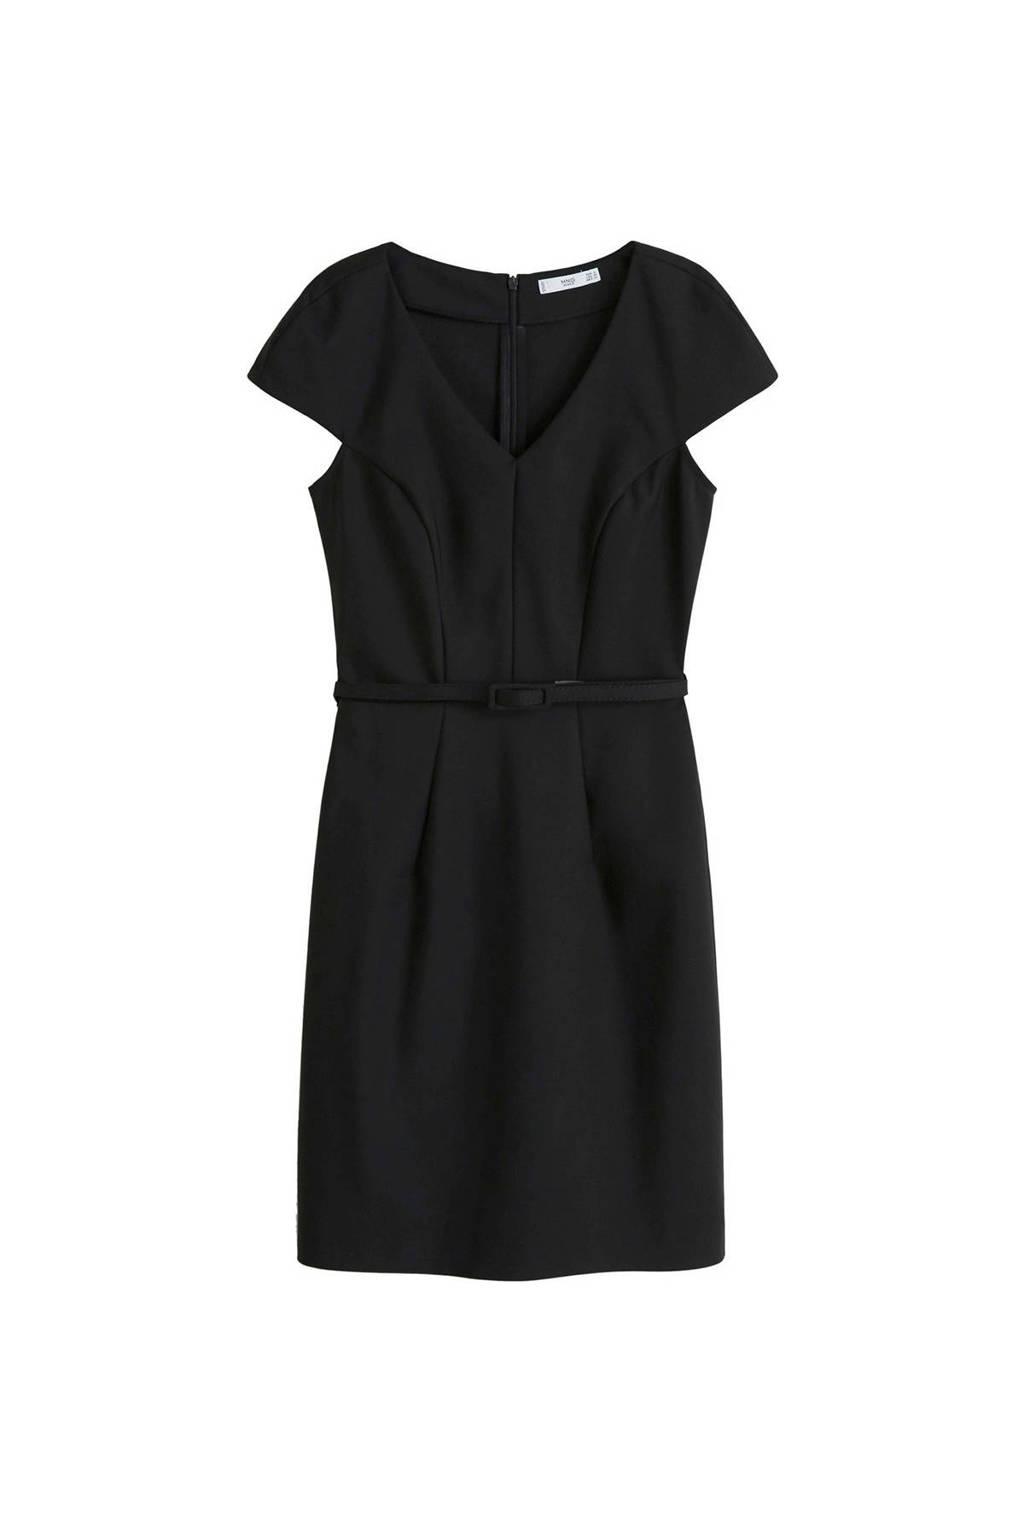 Mango jurk met ceintuur zwart, Zwart